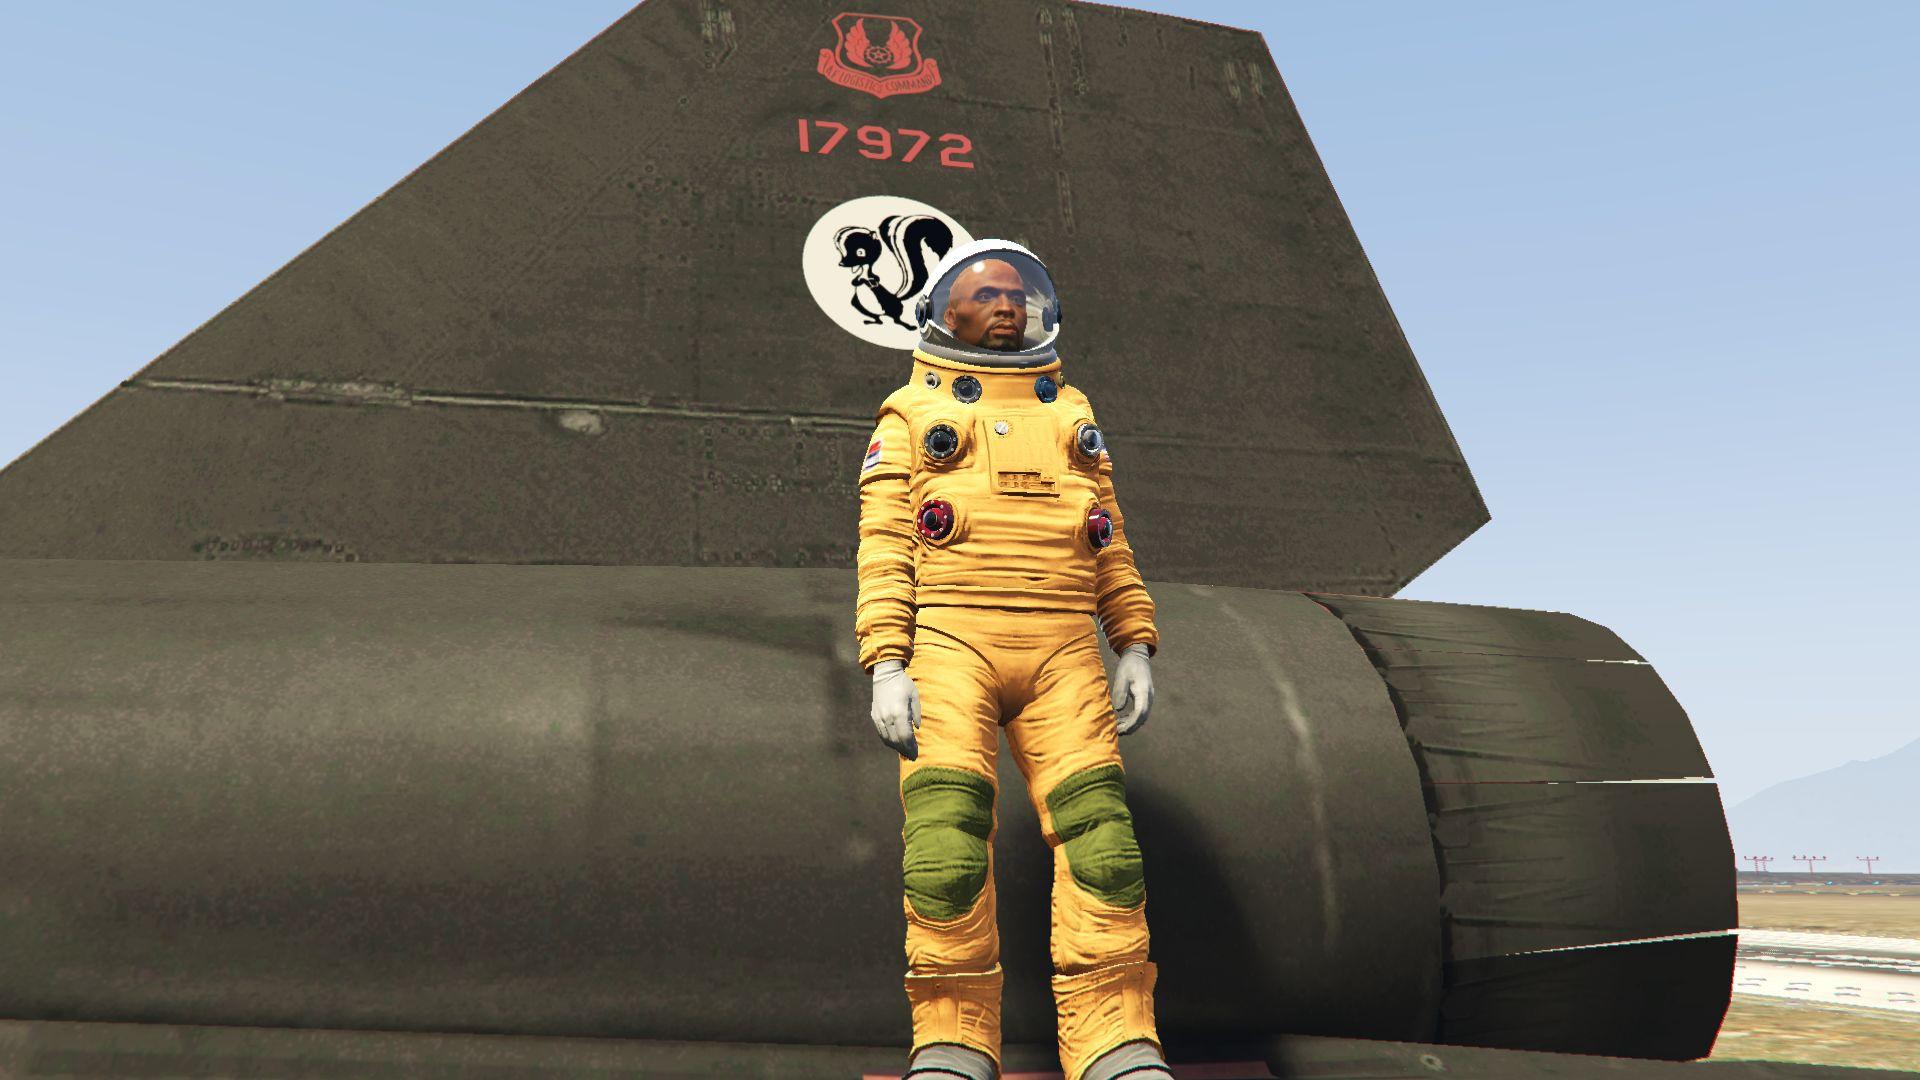 SR-71 Blackbird Pilot Suit - GTA5-Mods com